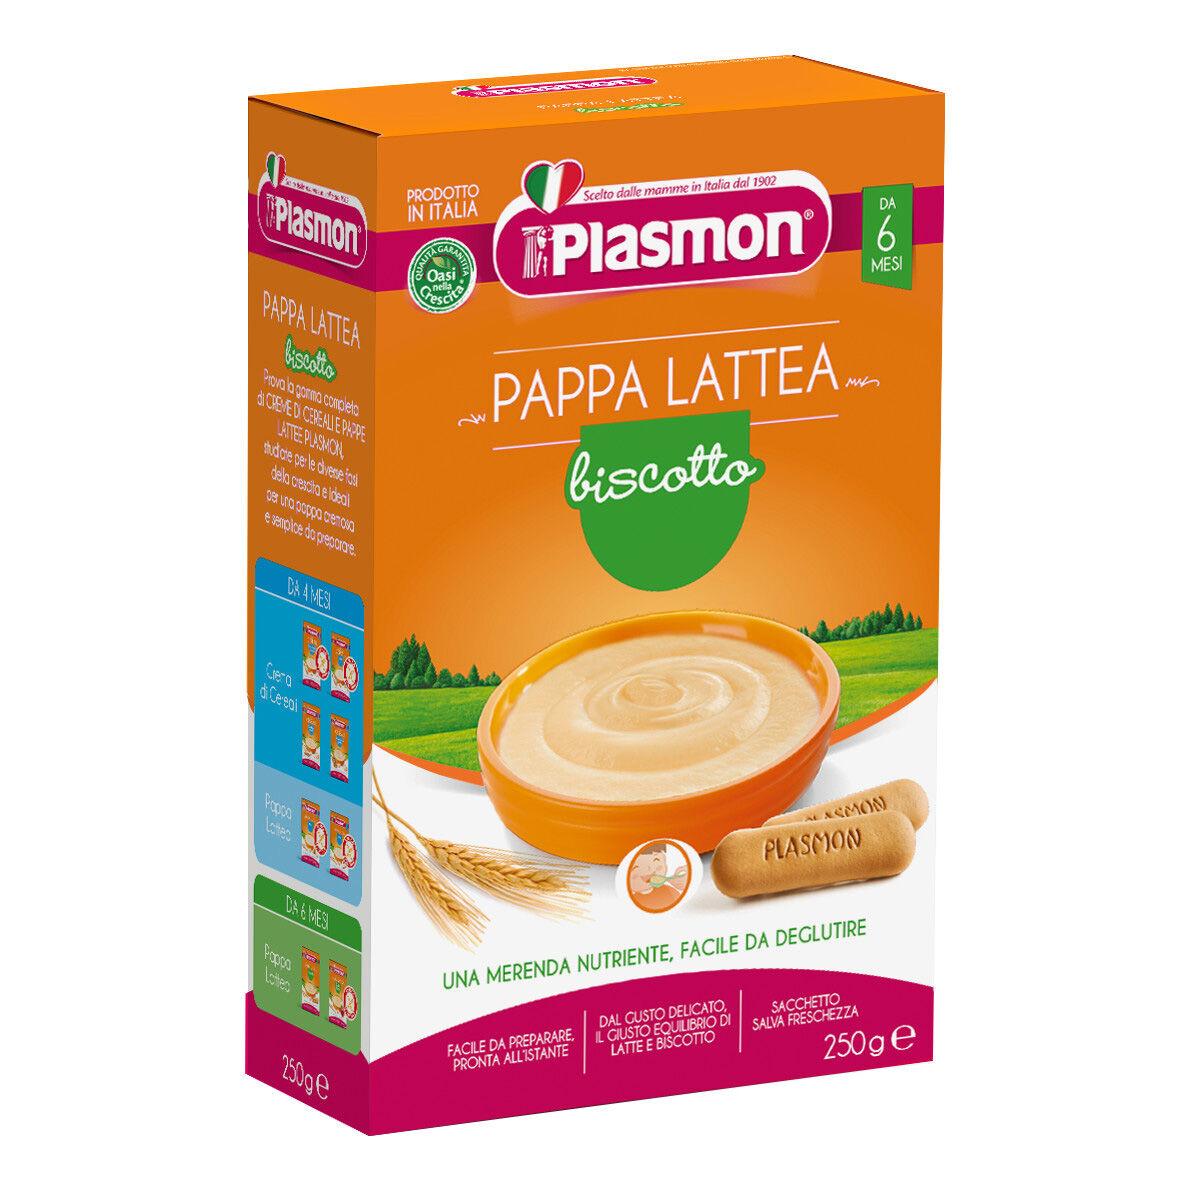 Plasmon Pappa Bisc.250g